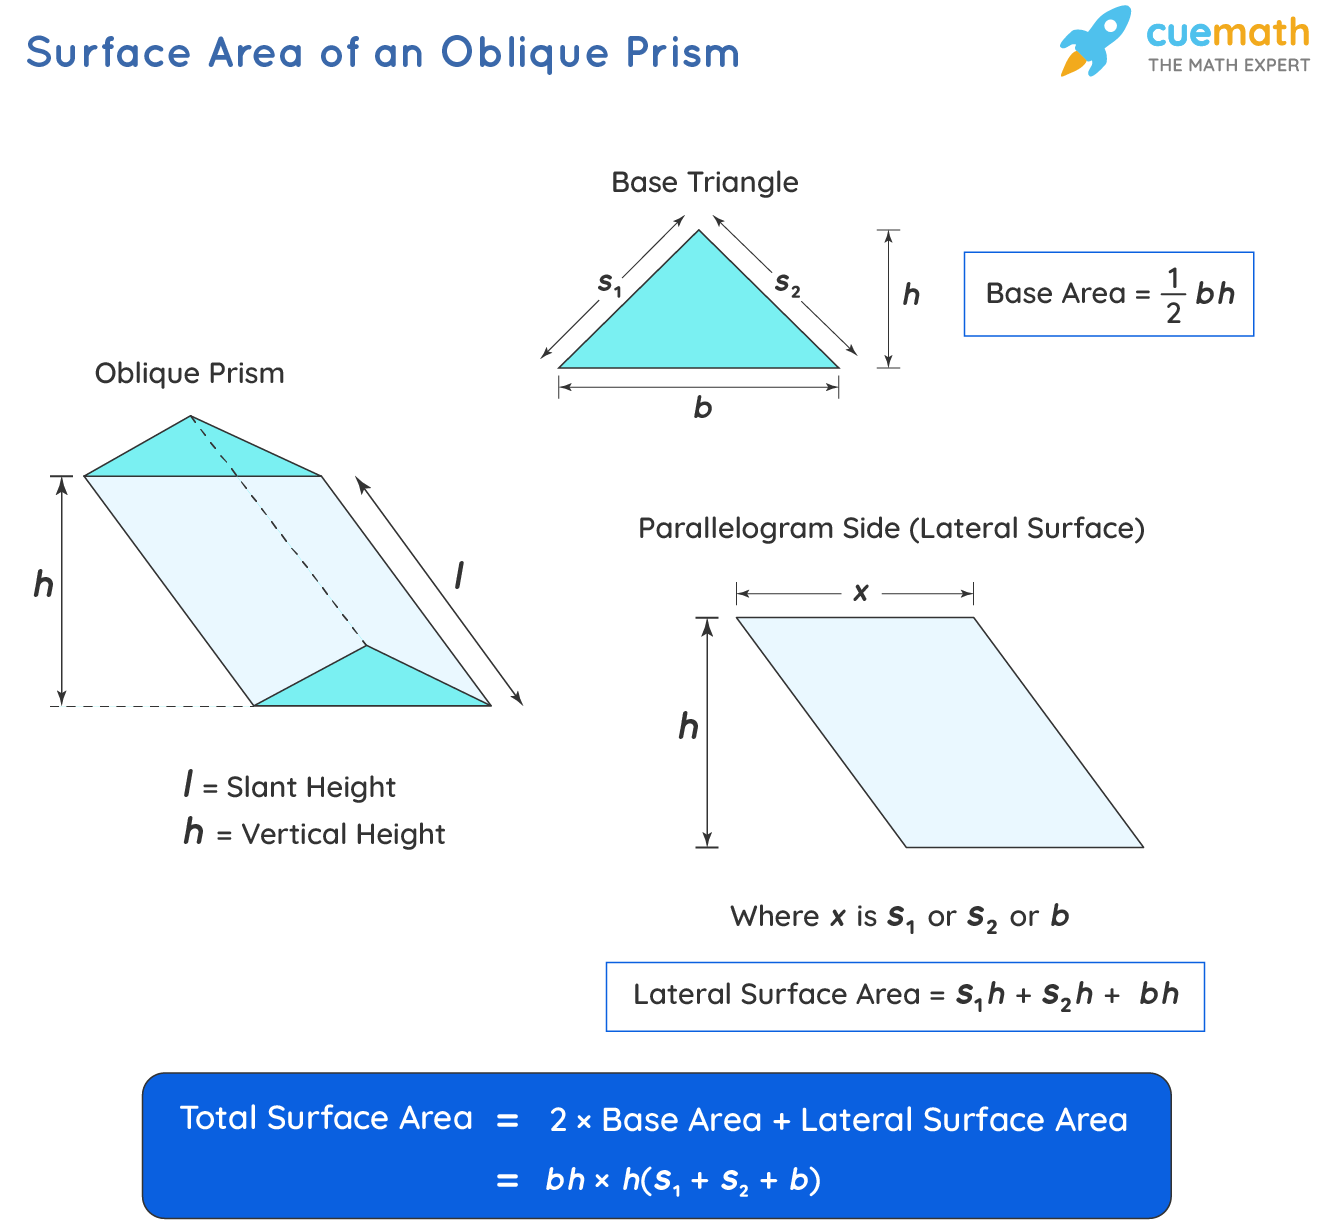 Surface Area of an oblique prism